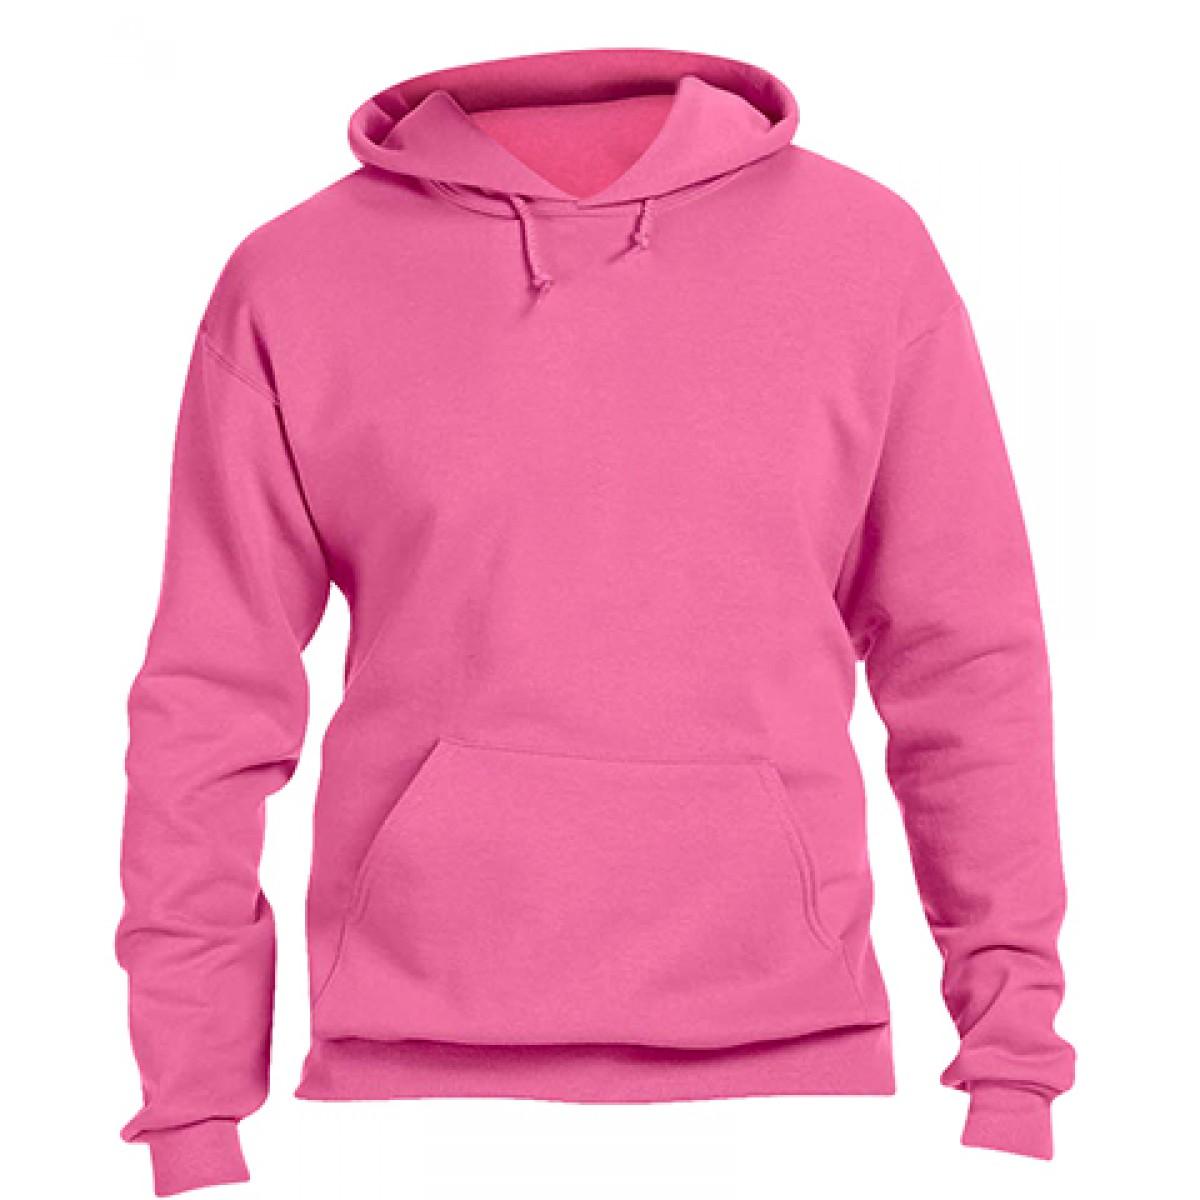 Pullover Hood 50/50 Preshrunk Fleece